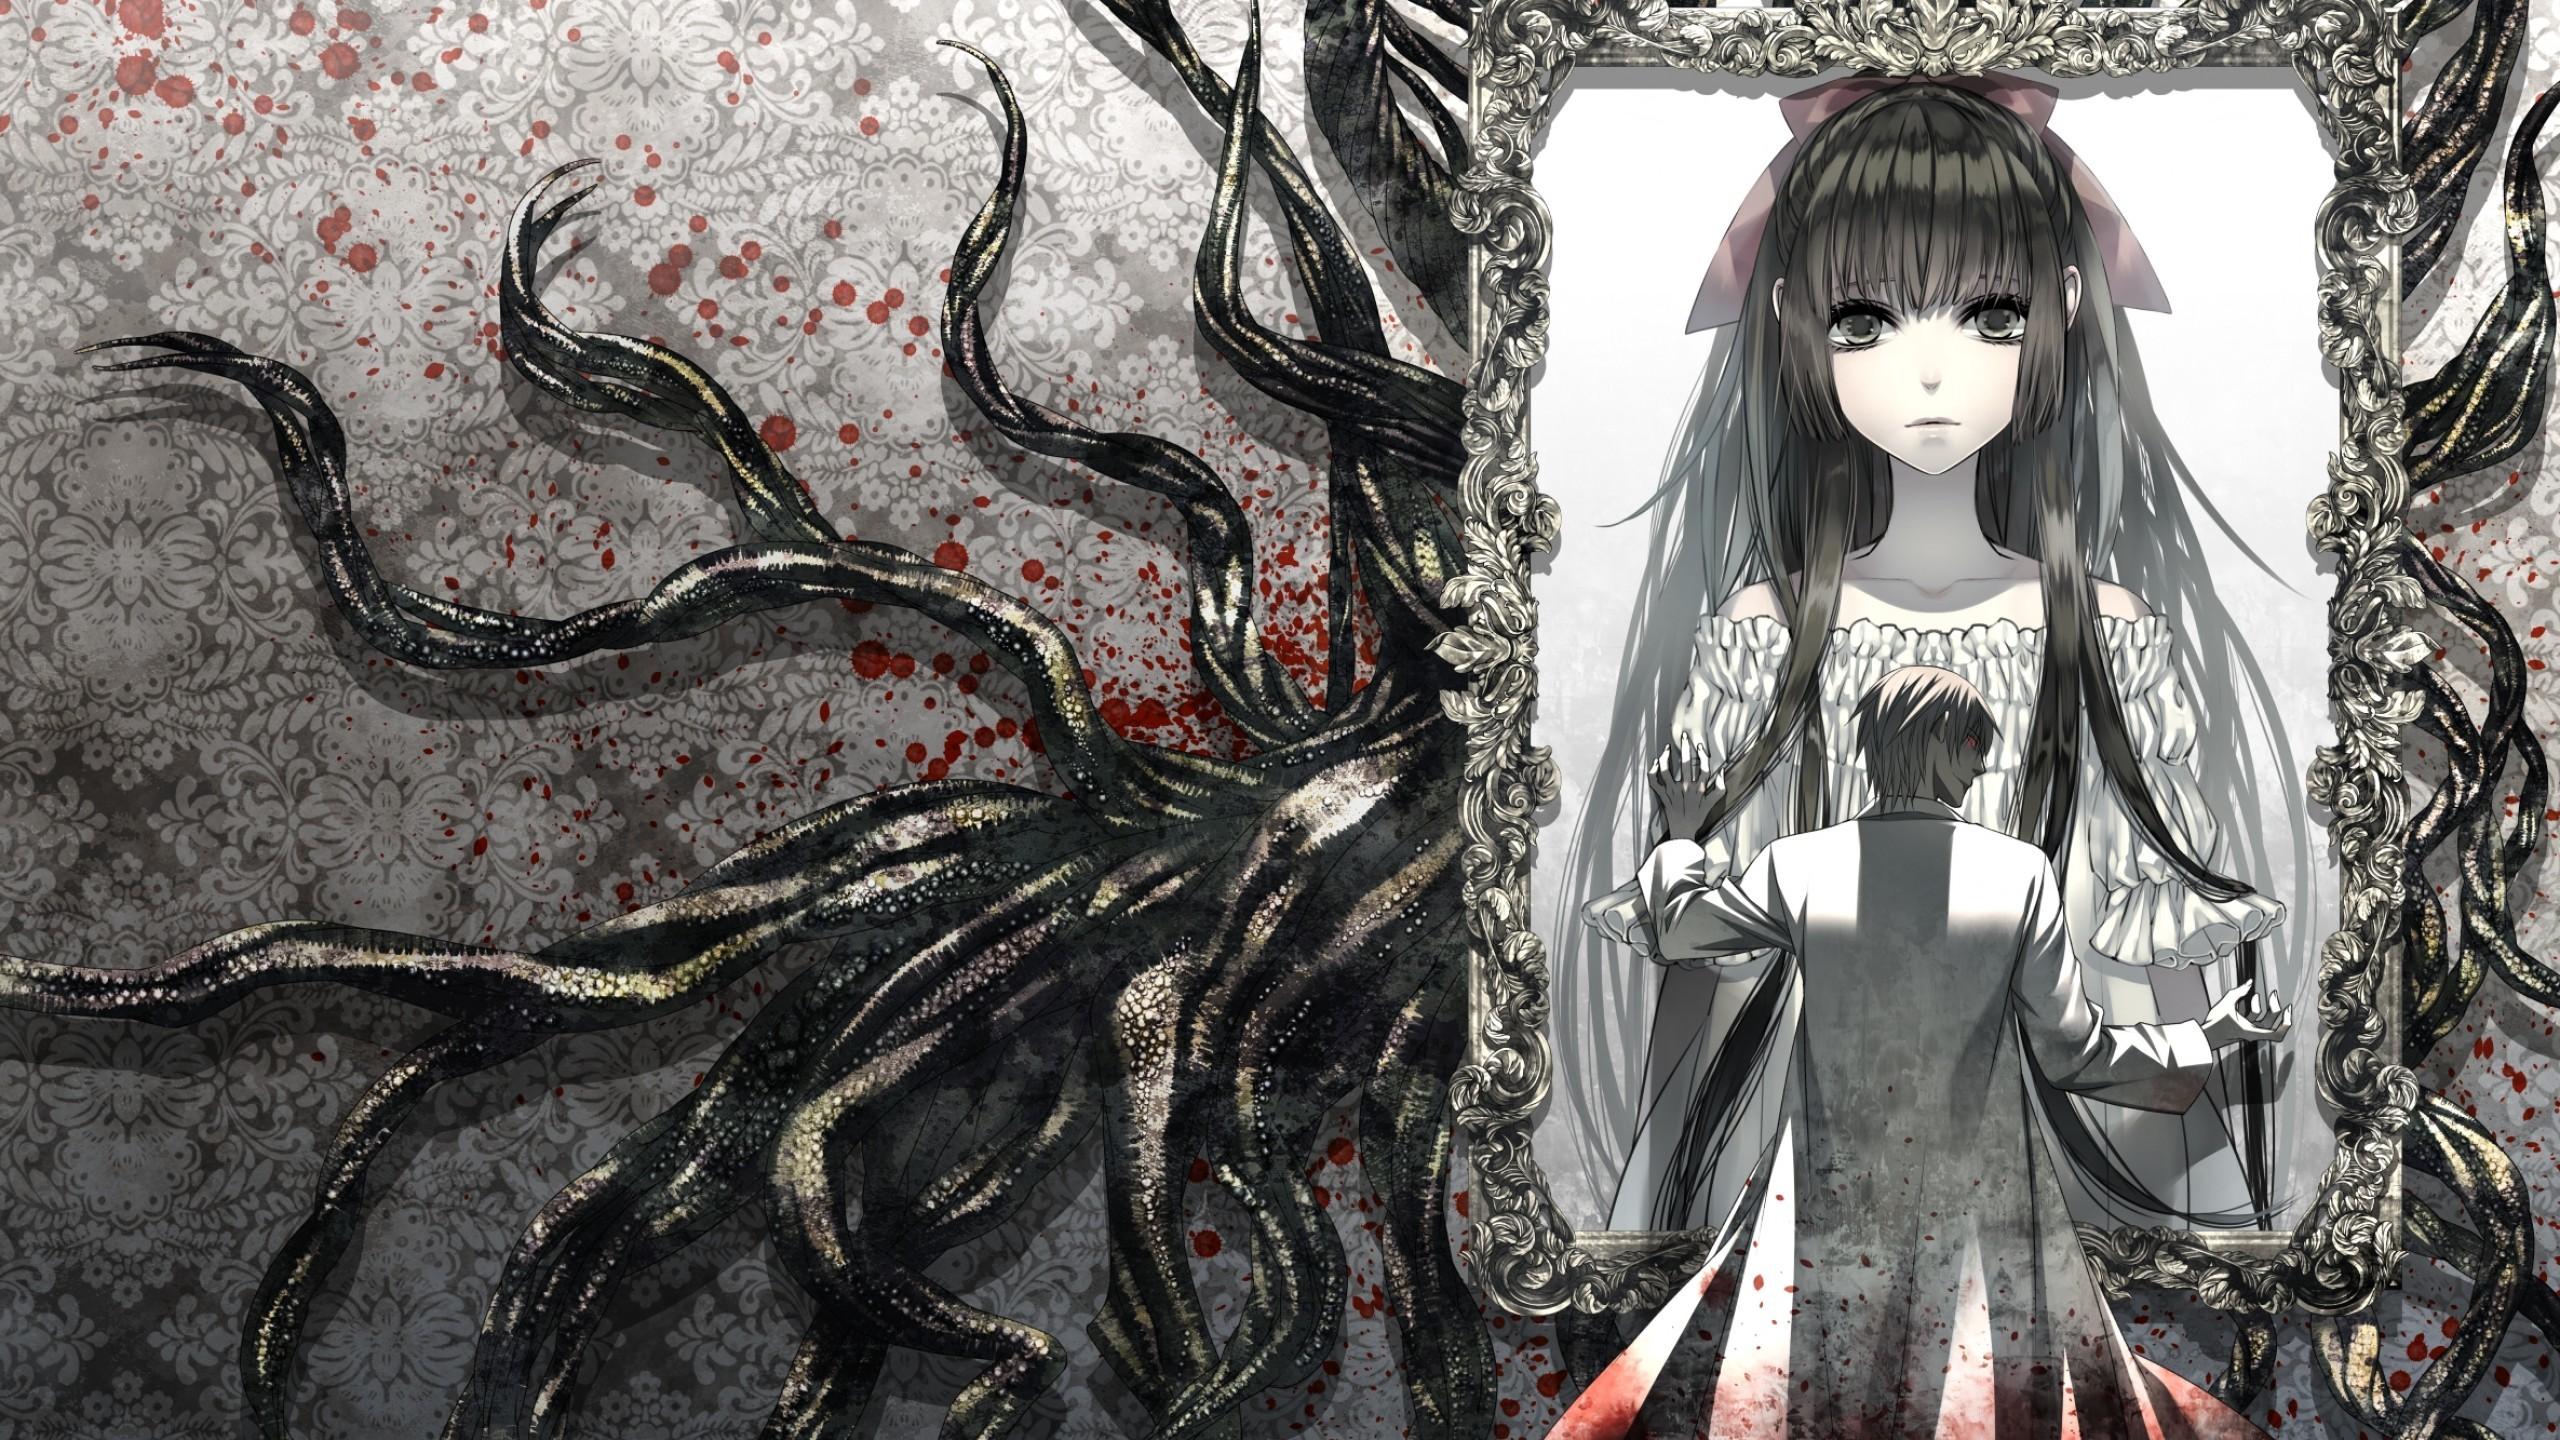 Anime Girl, Creepy, Portrait, Anime Boy